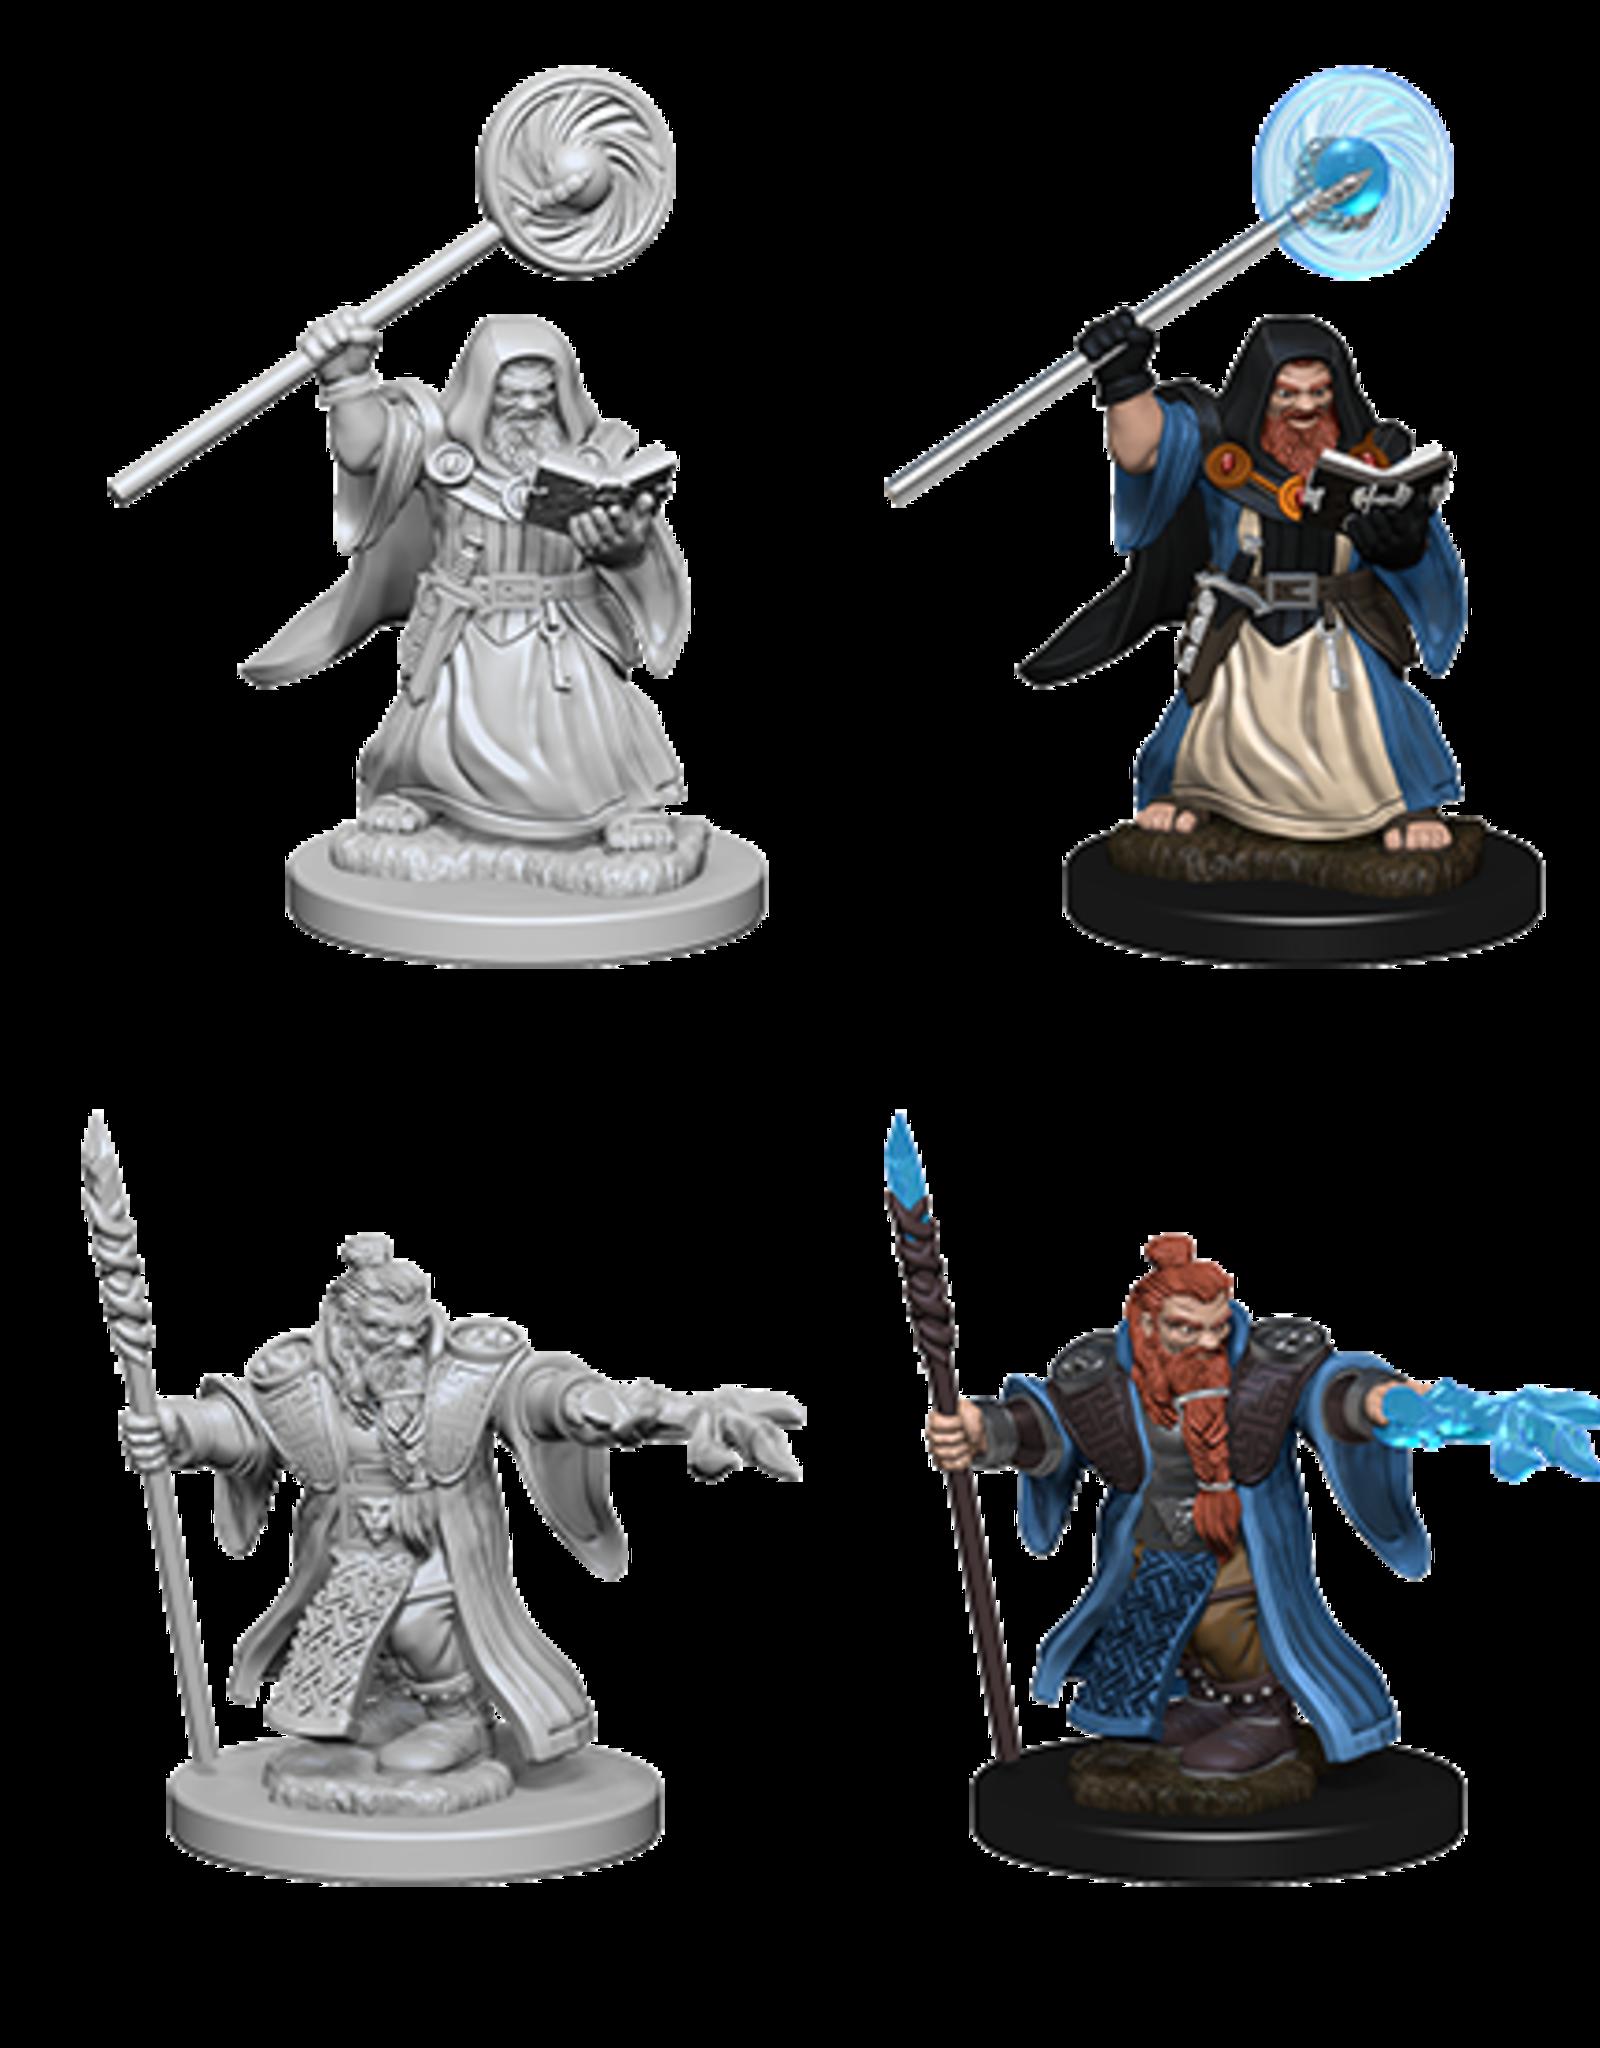 Dungeons & Dragons D&D NMU - Male Dwarf Wizard